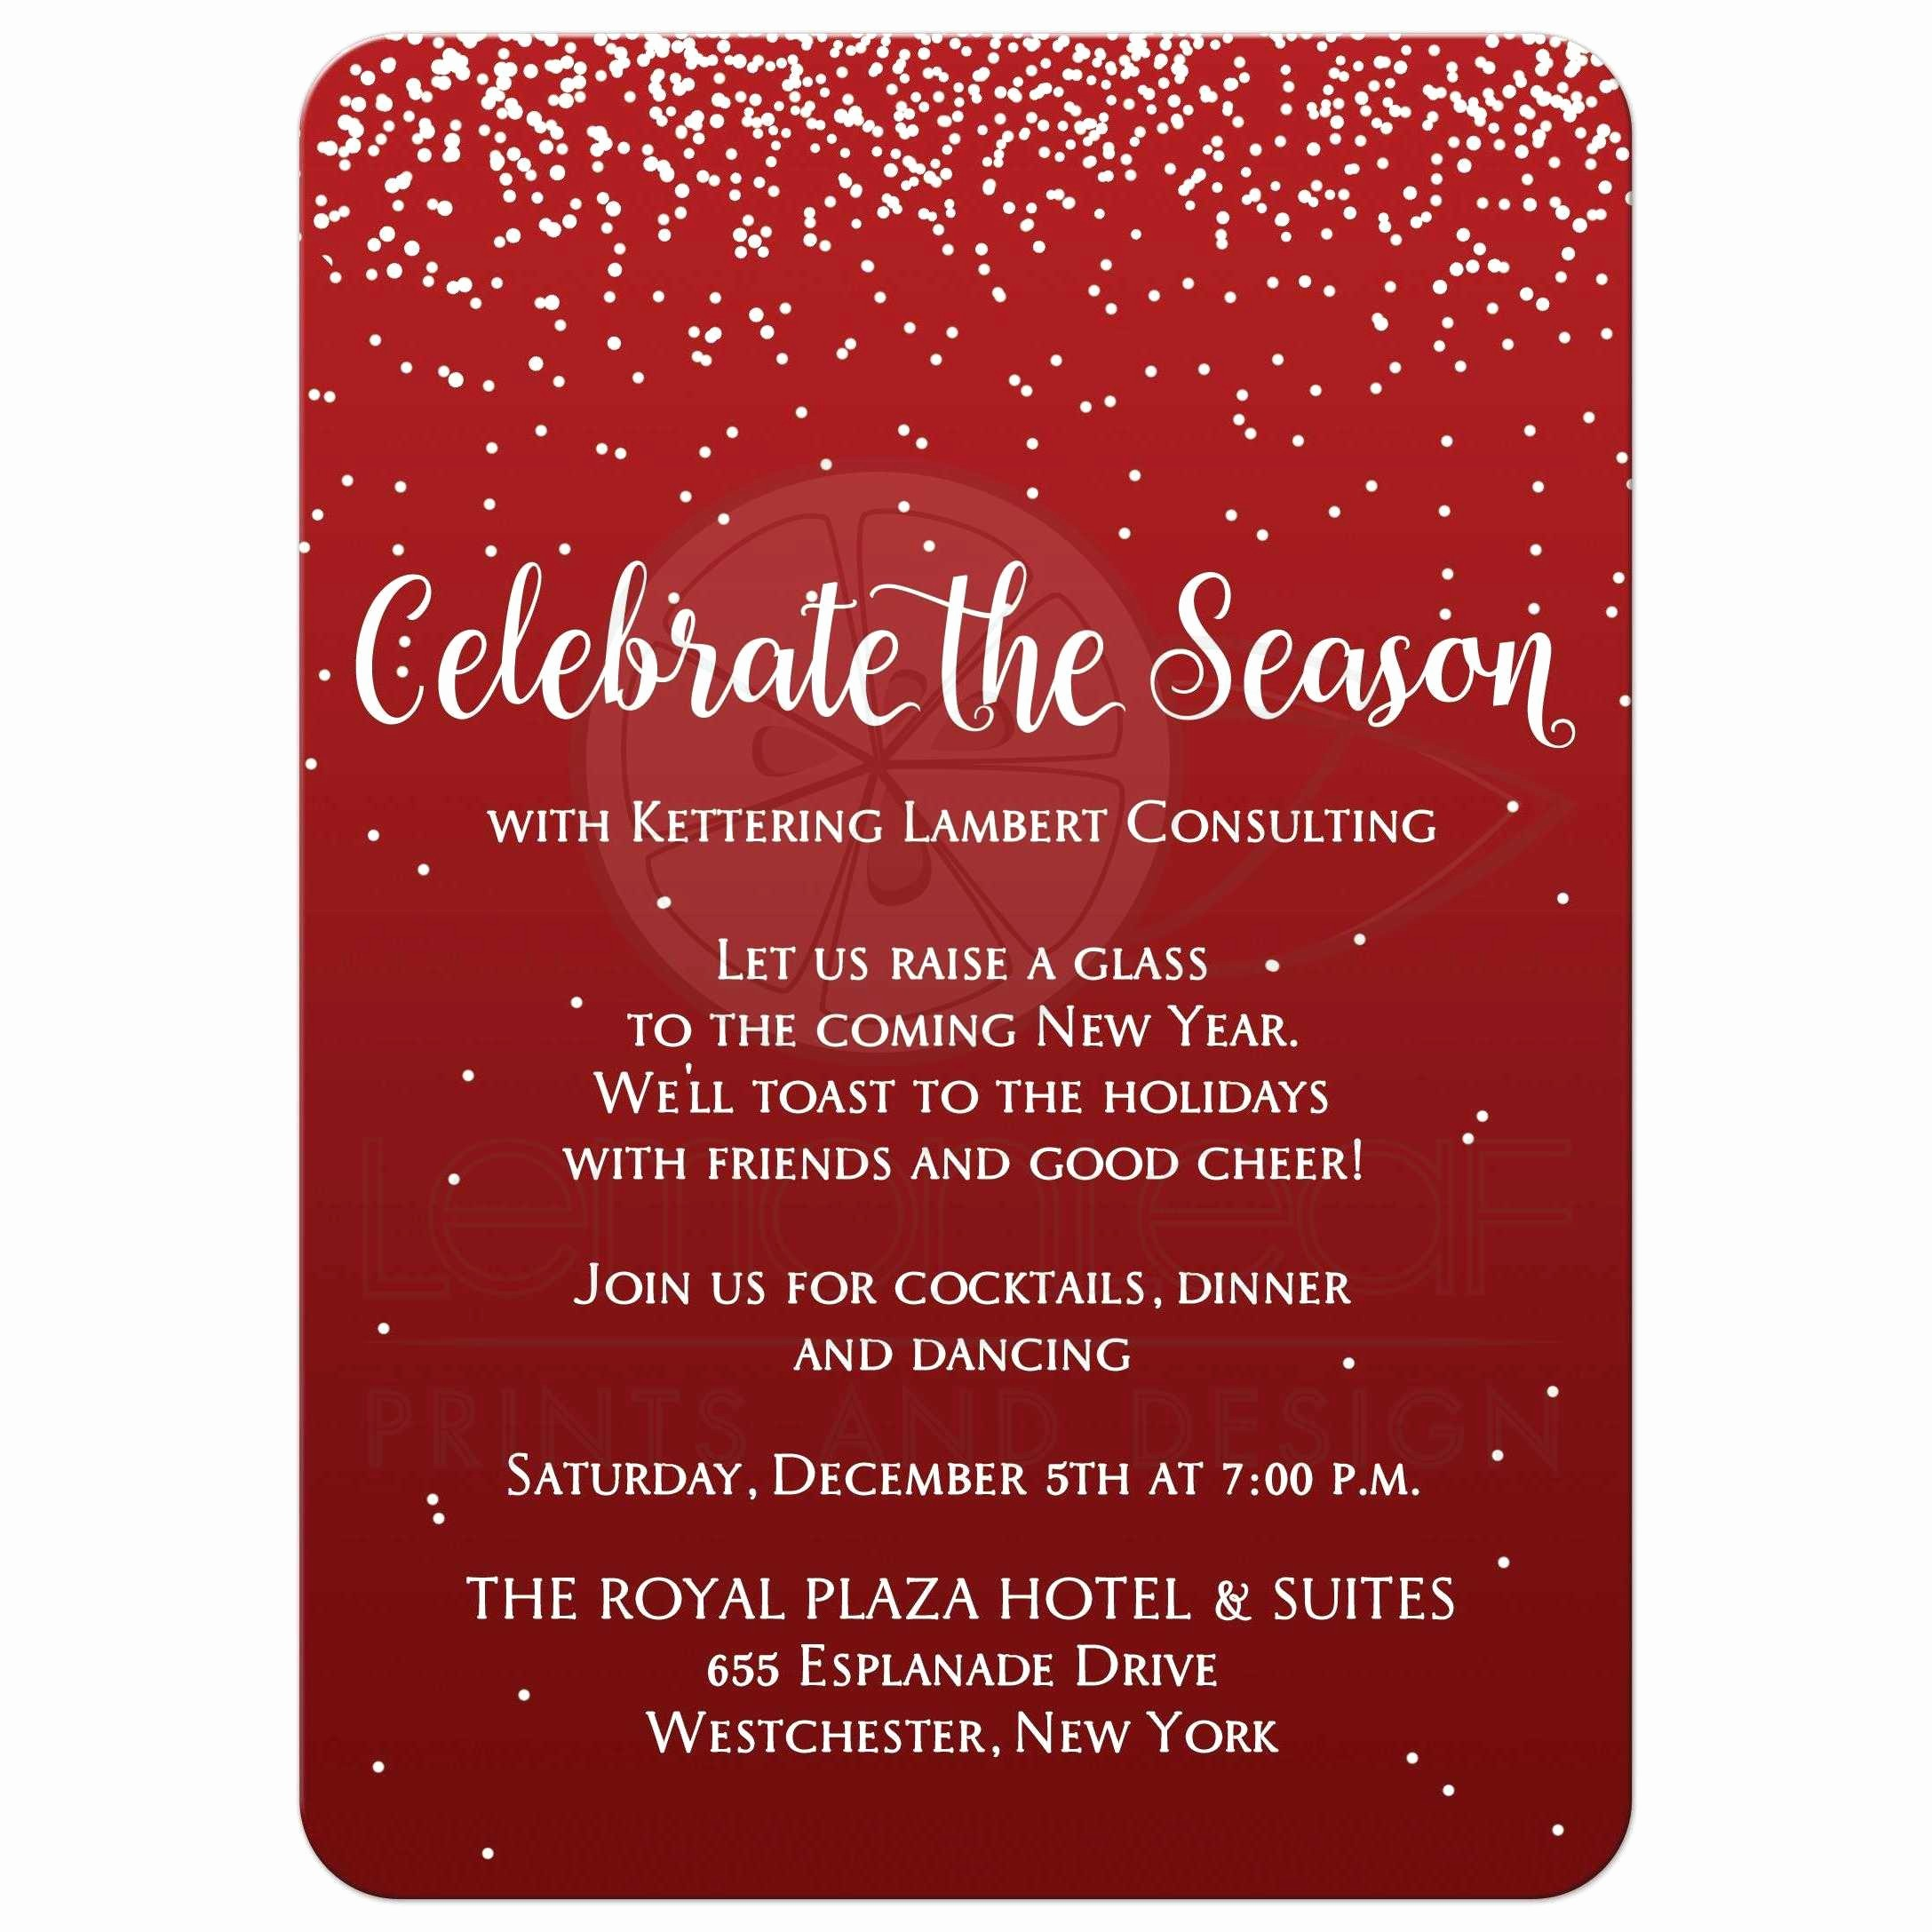 Company Holiday Party Invitation Template Inspirational Pany Christmas Party Invitations